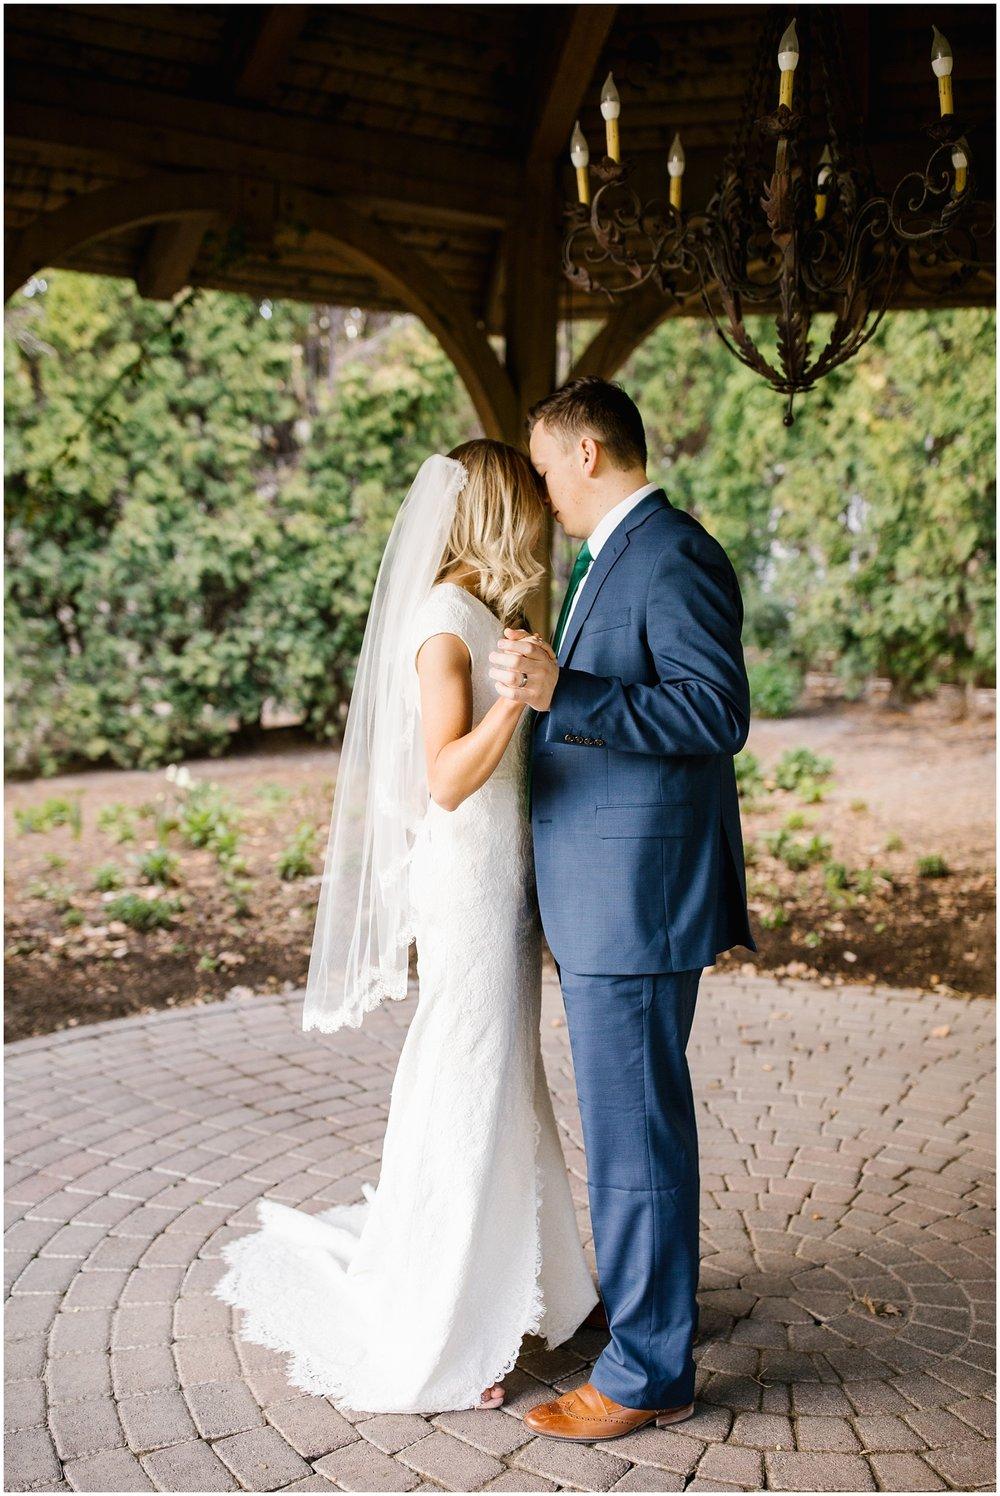 TA-Bridals-14_Lizzie-B-Imagery-Utah-Wedding-Photographer-Park-City-Salt-Lake-City-Thanksgiving-Point-Ashton-Gardens-Lehi-Utah.jpg